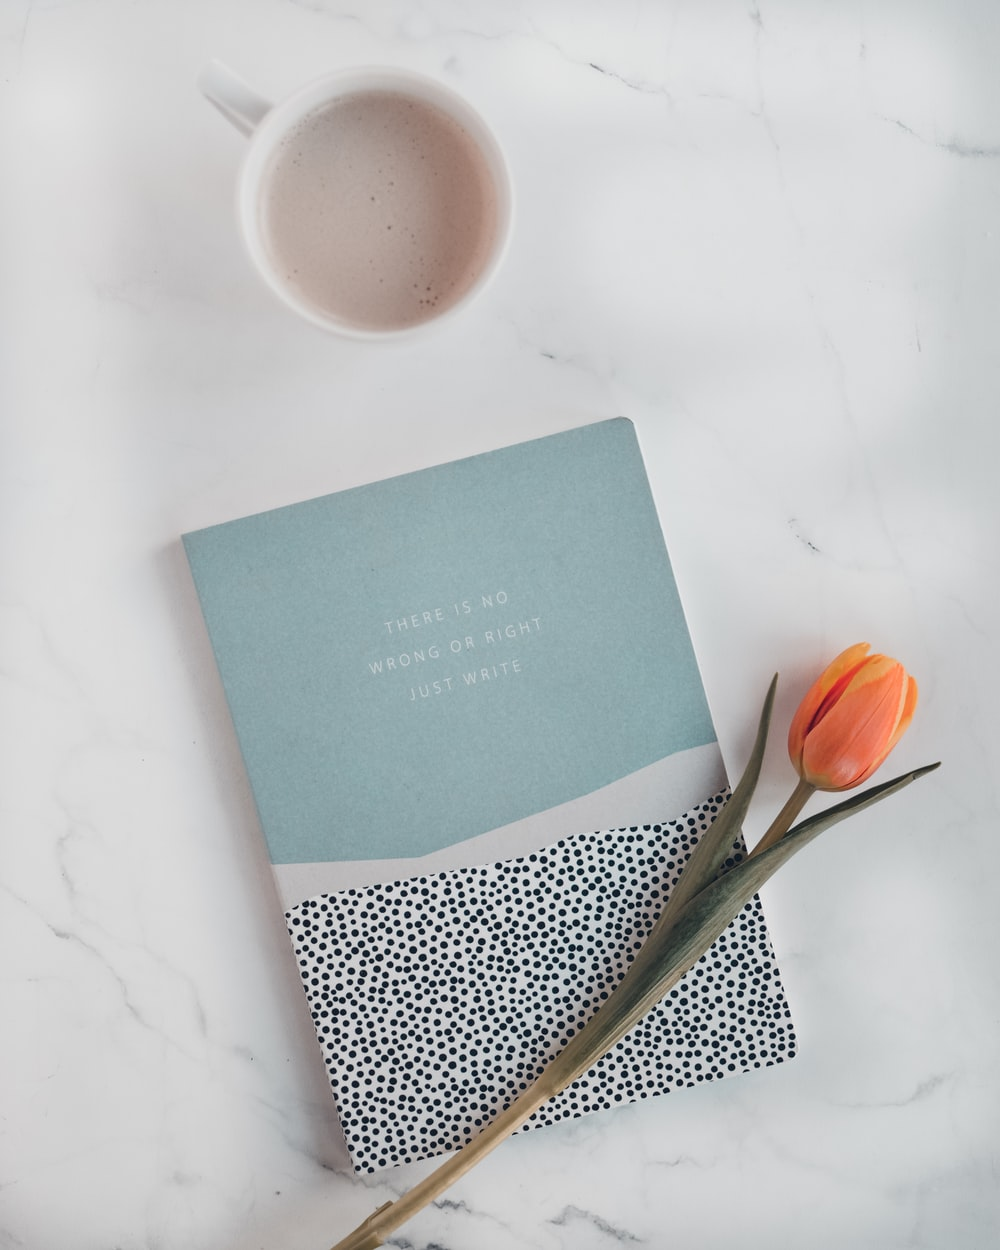 orange tulip and blue labeled book